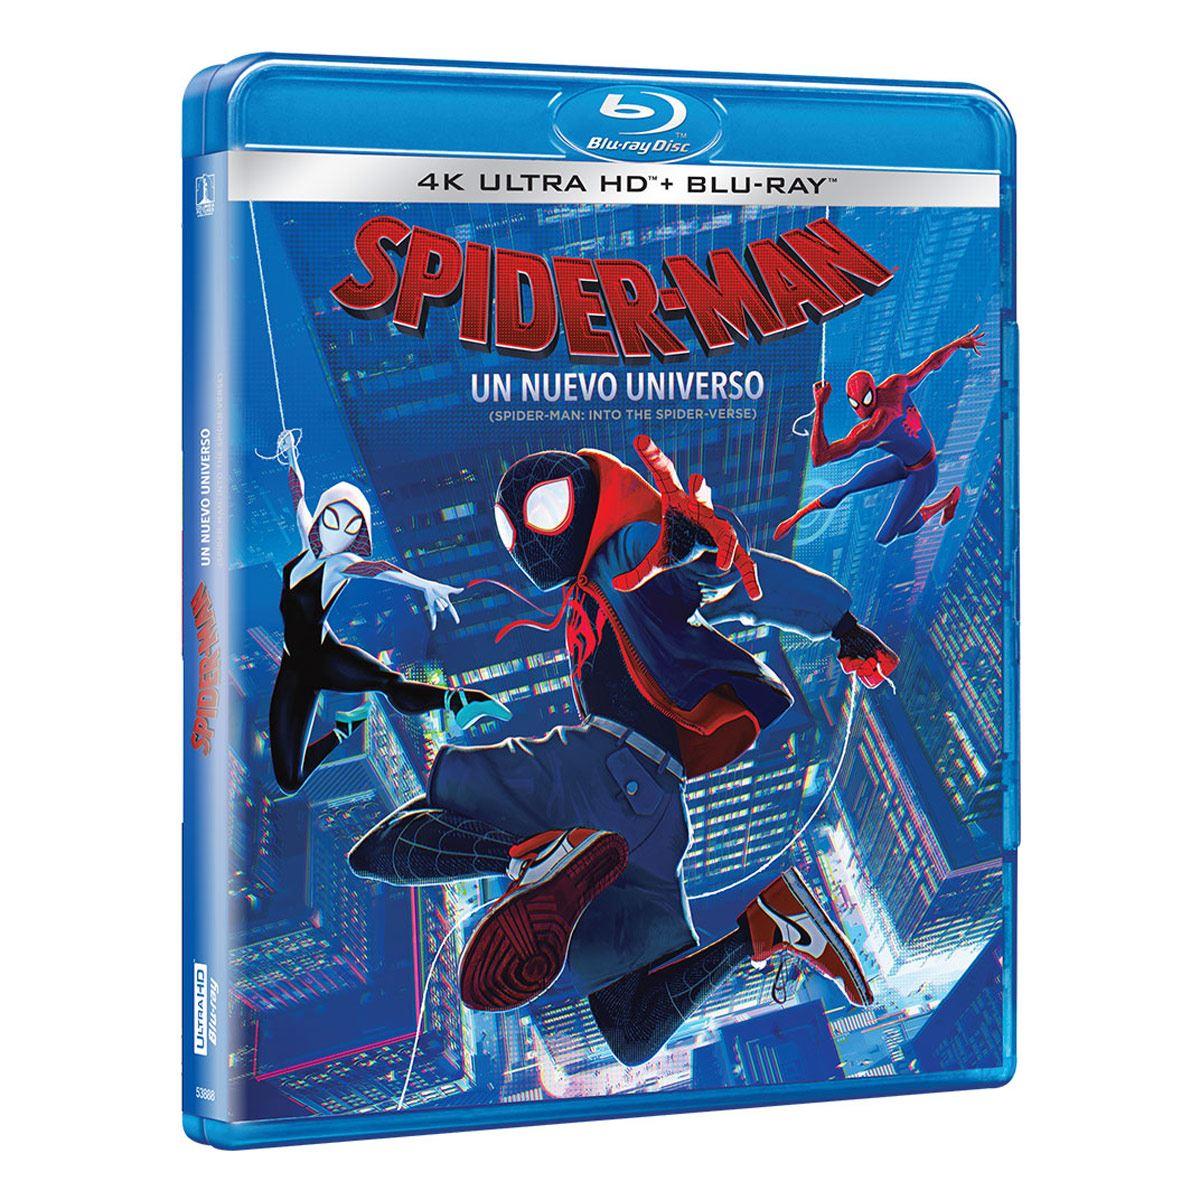 4K Spiderman Un Nuevo Universo